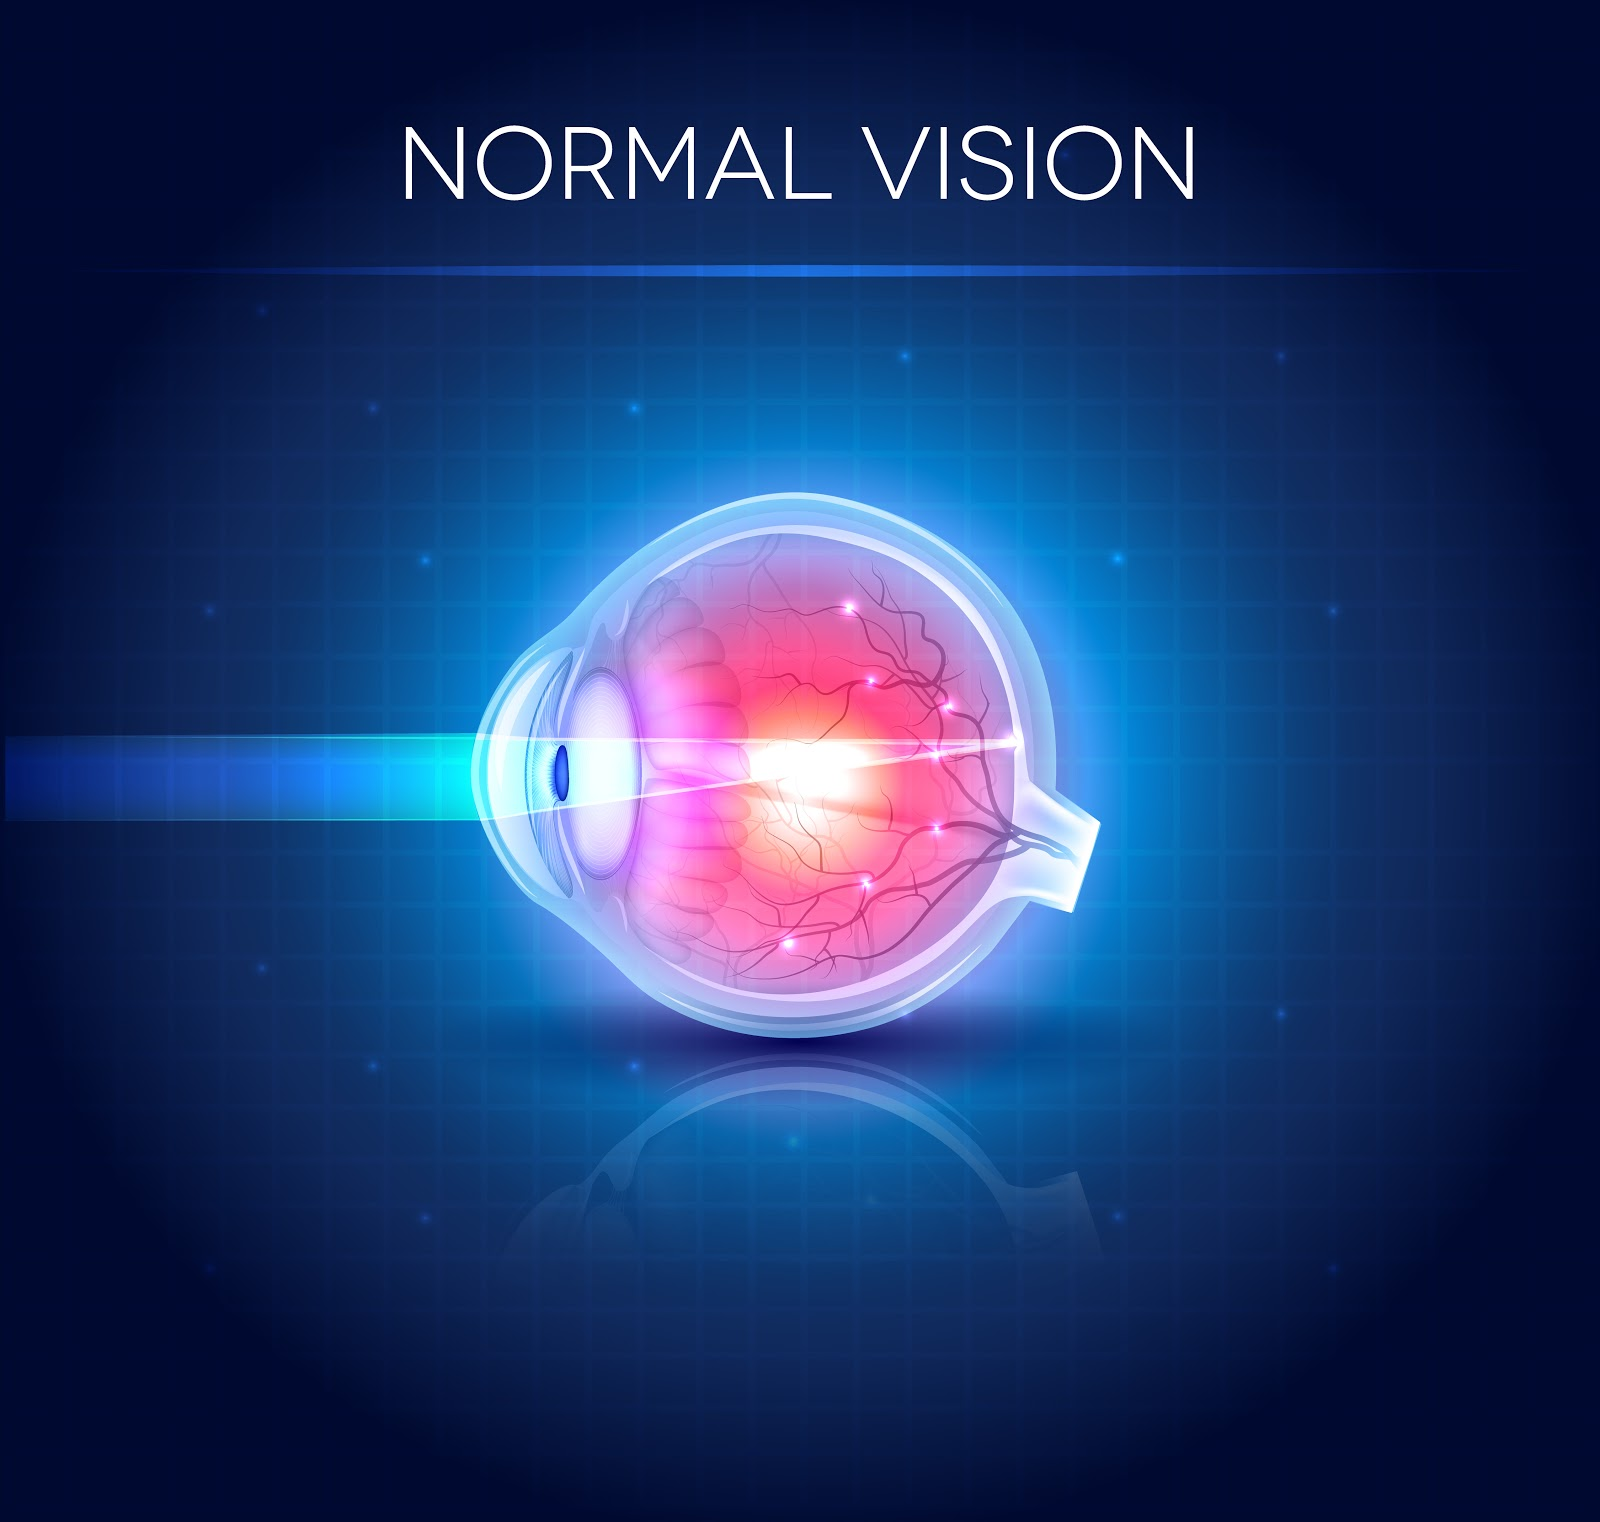 Astigmatism ce viziune Astigmatism miopic dificil pentru ambii ochi la copii: tratament - Viziune -